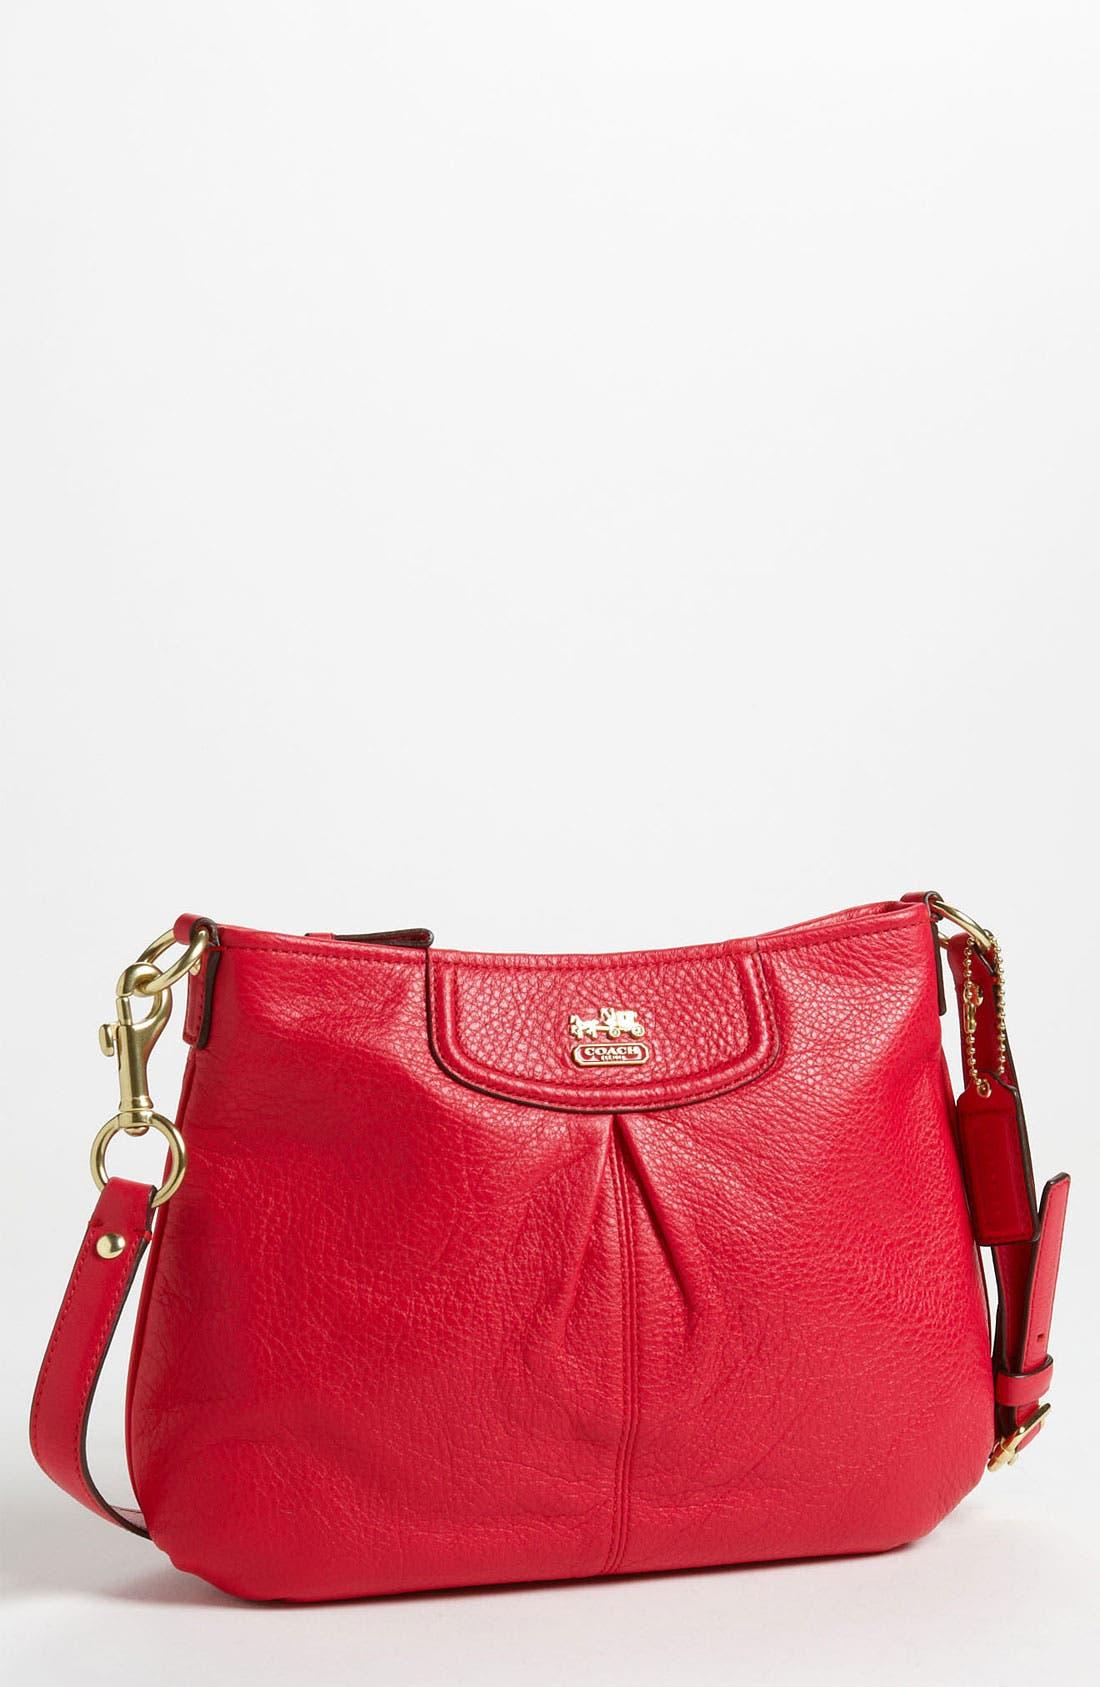 Alternate Image 1 Selected - COACH 'Madison - Swingpack' Leather Crossbody Bag